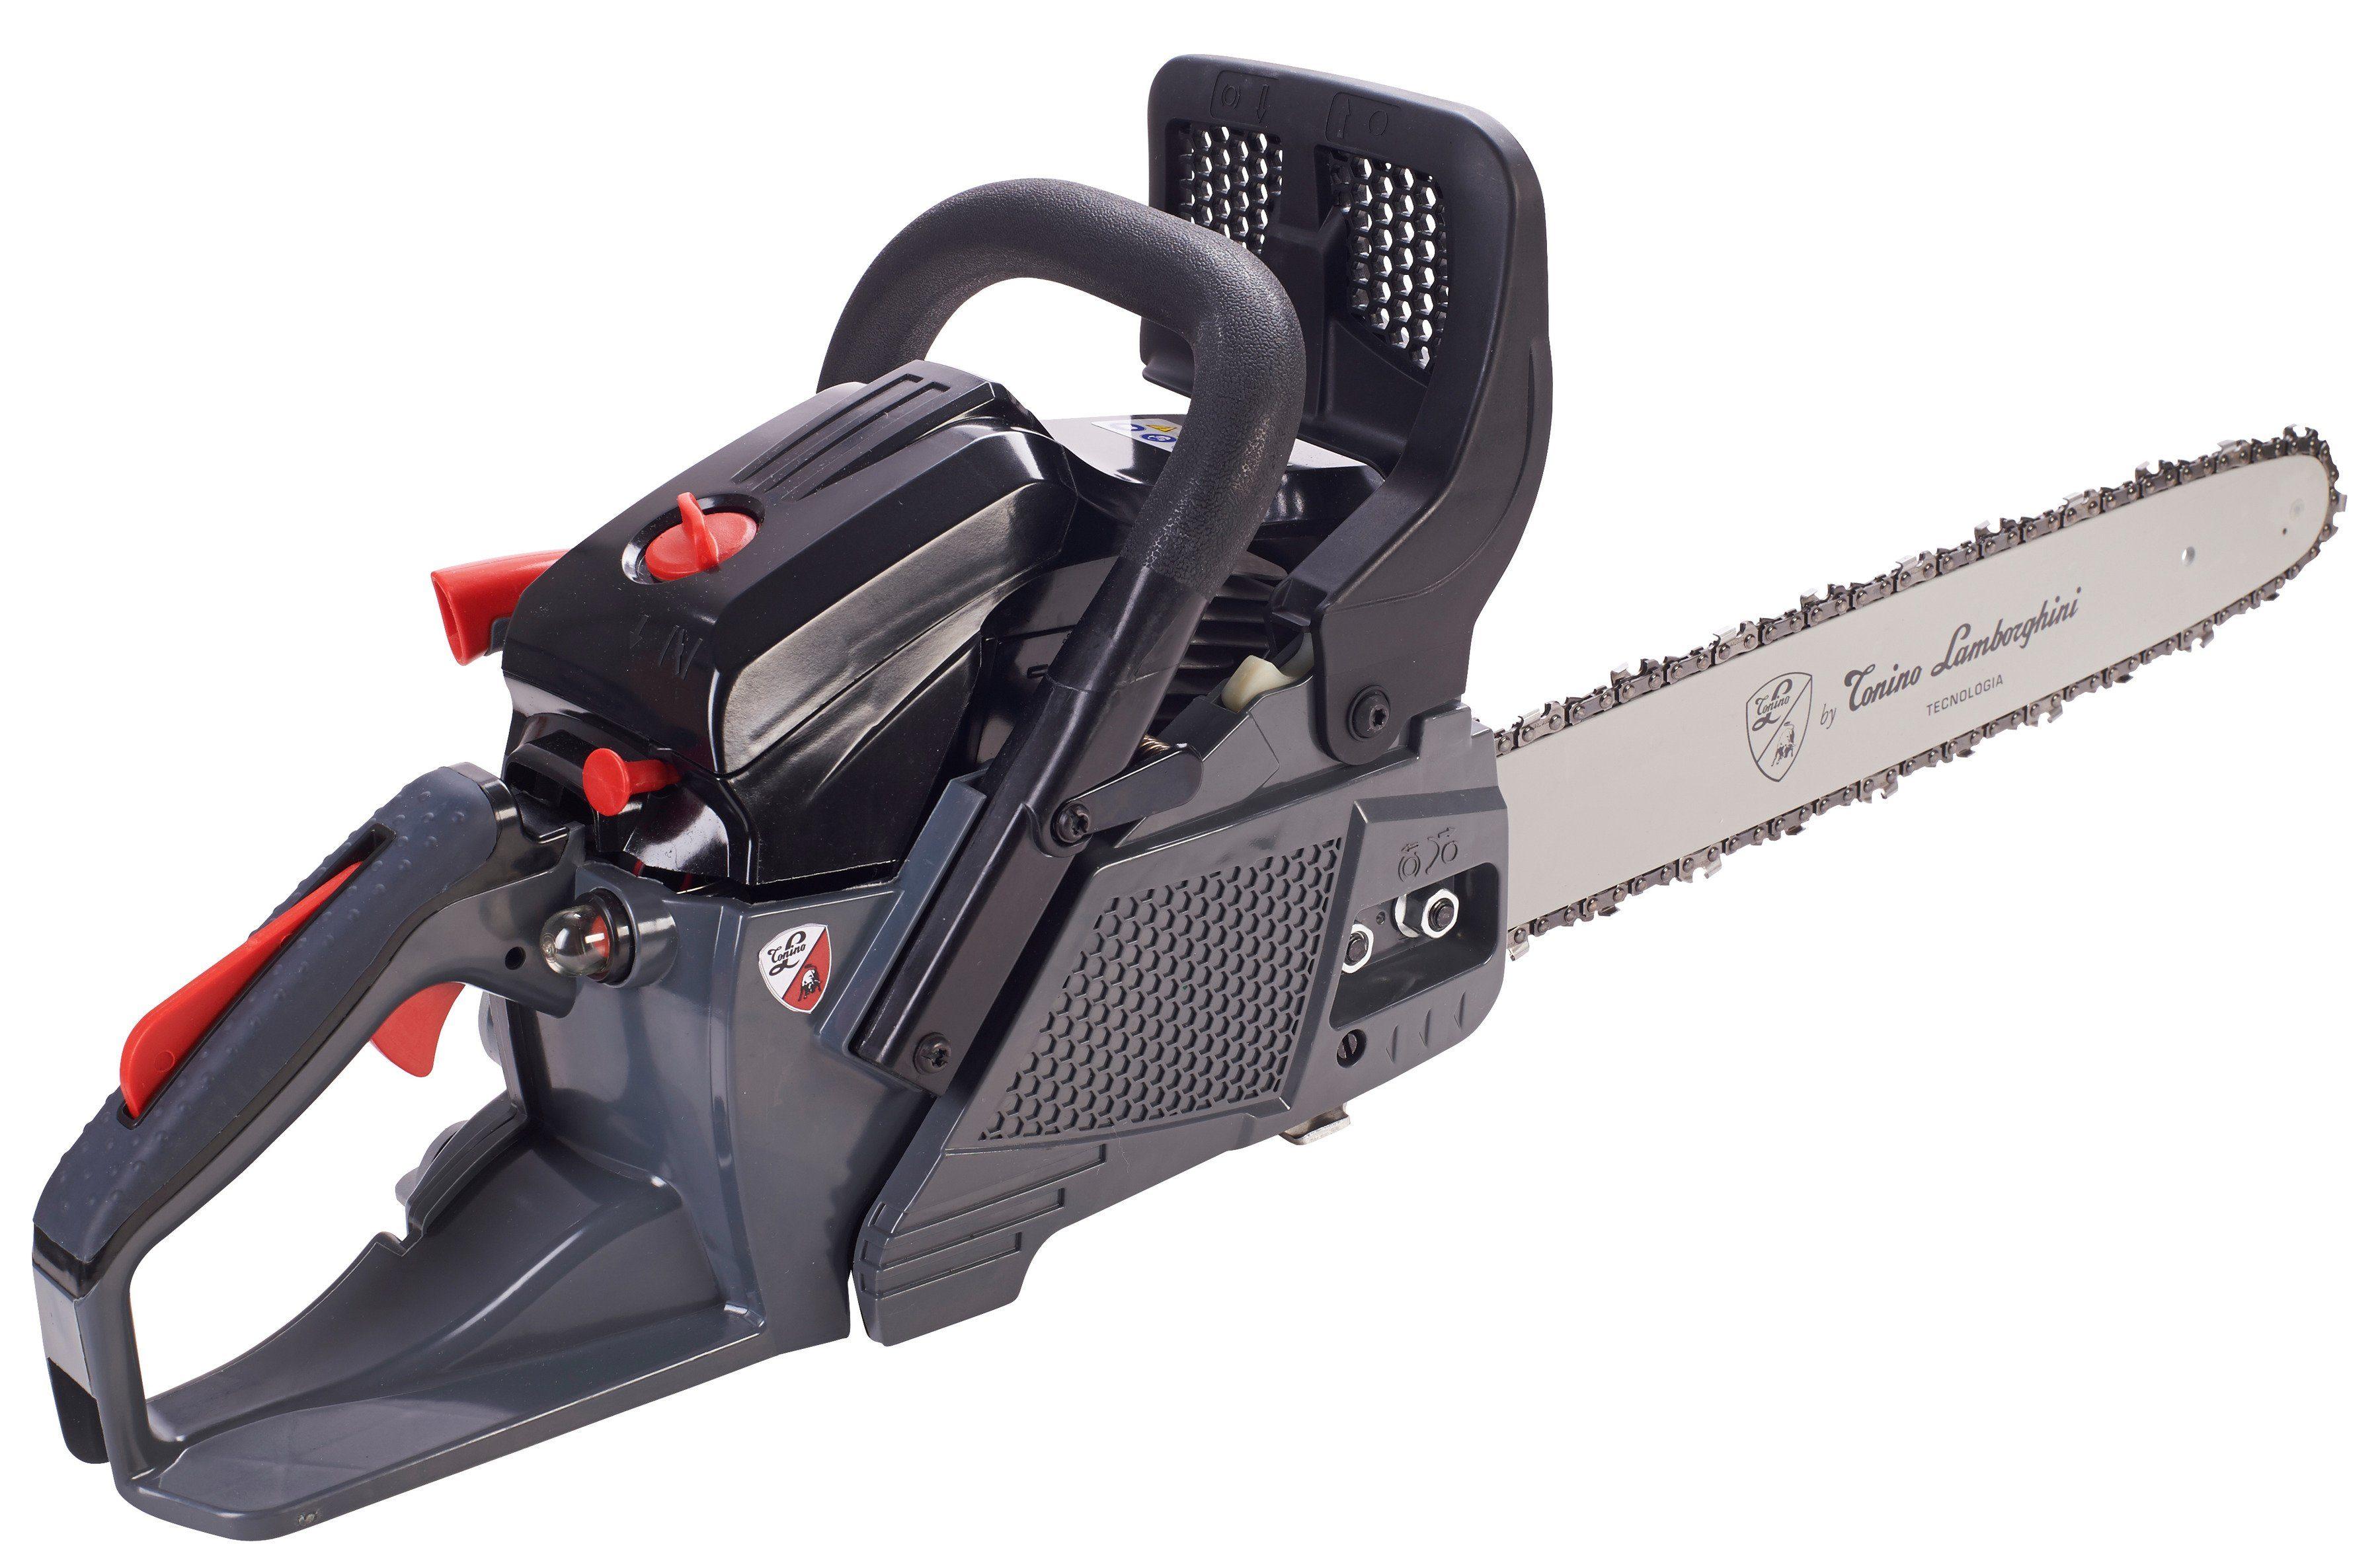 TONINO LAMBORGHINI Benzin-Kettensäge »PC 41 TL«, 40 cm Schwertlänge